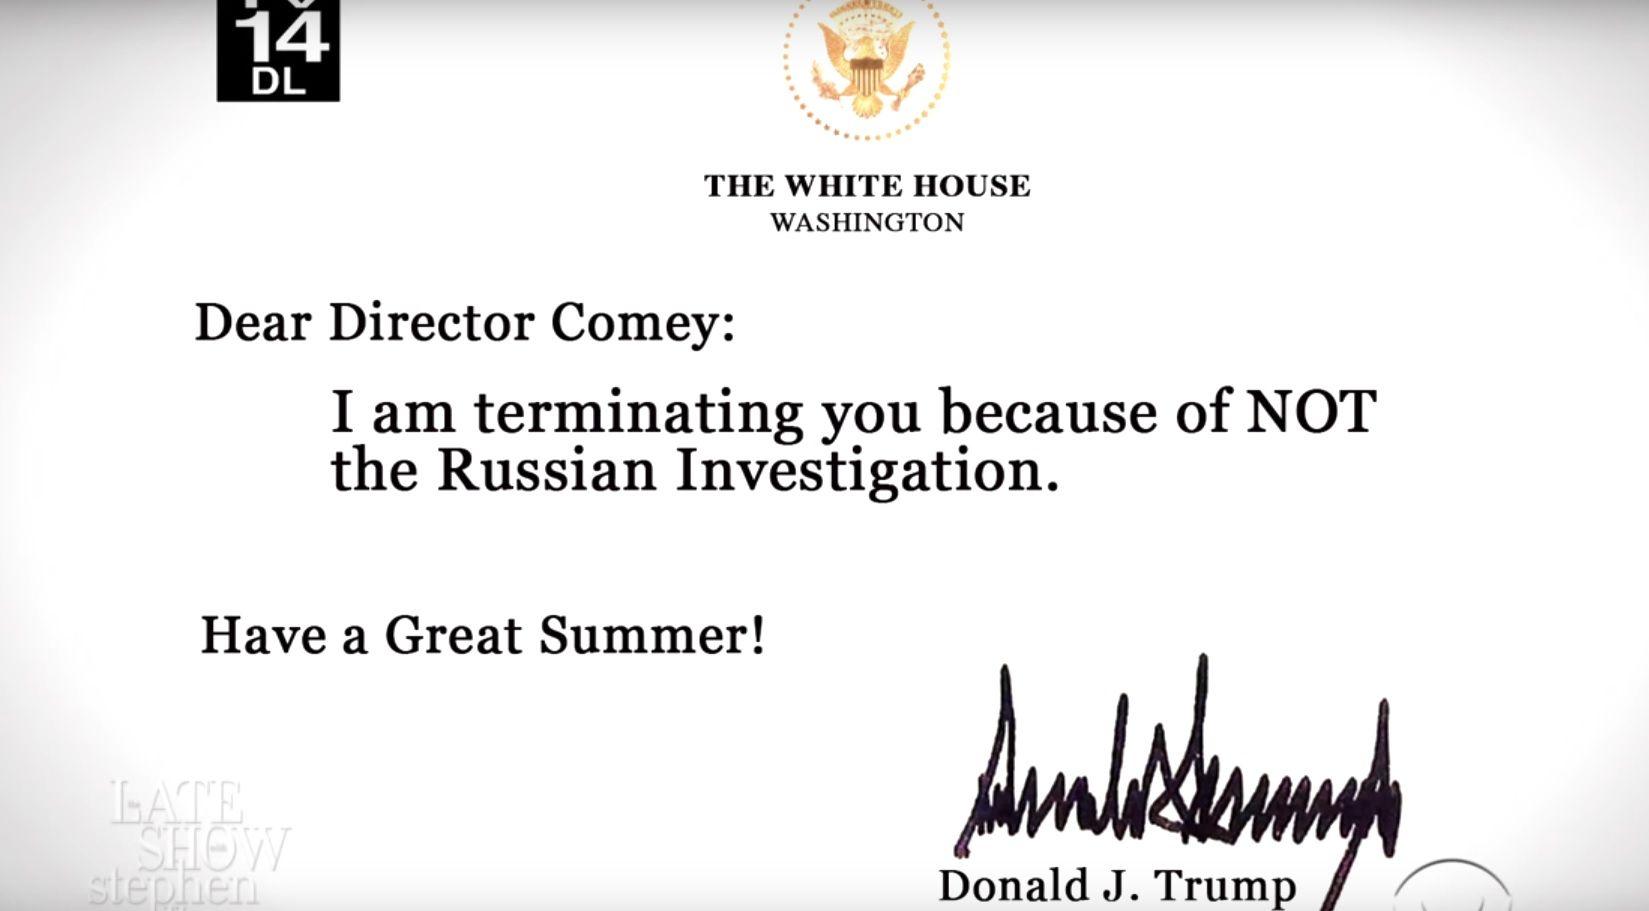 Stephen Colbert Presents \u0027Trump\u0027s Letters\u0027 Firing Comey